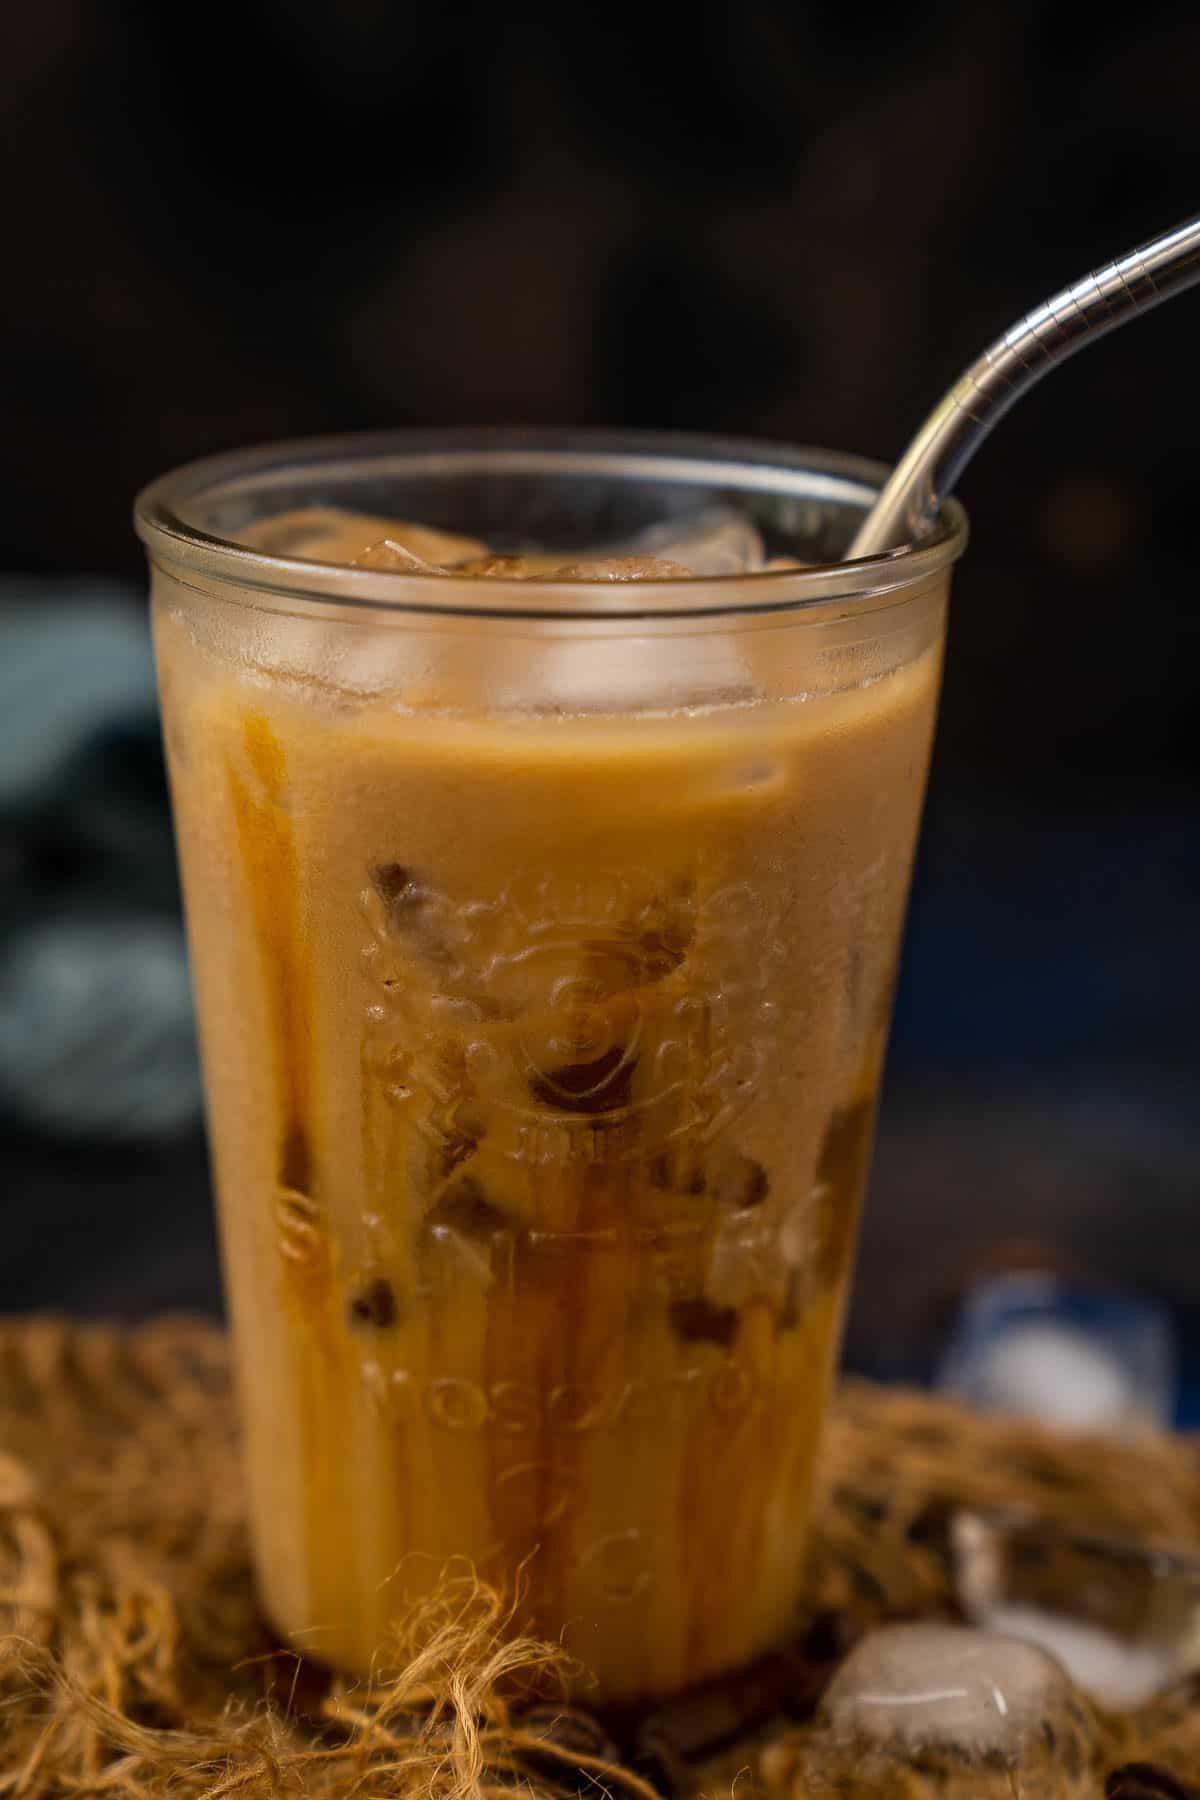 Iced Caramel Macchiato served in a glass.